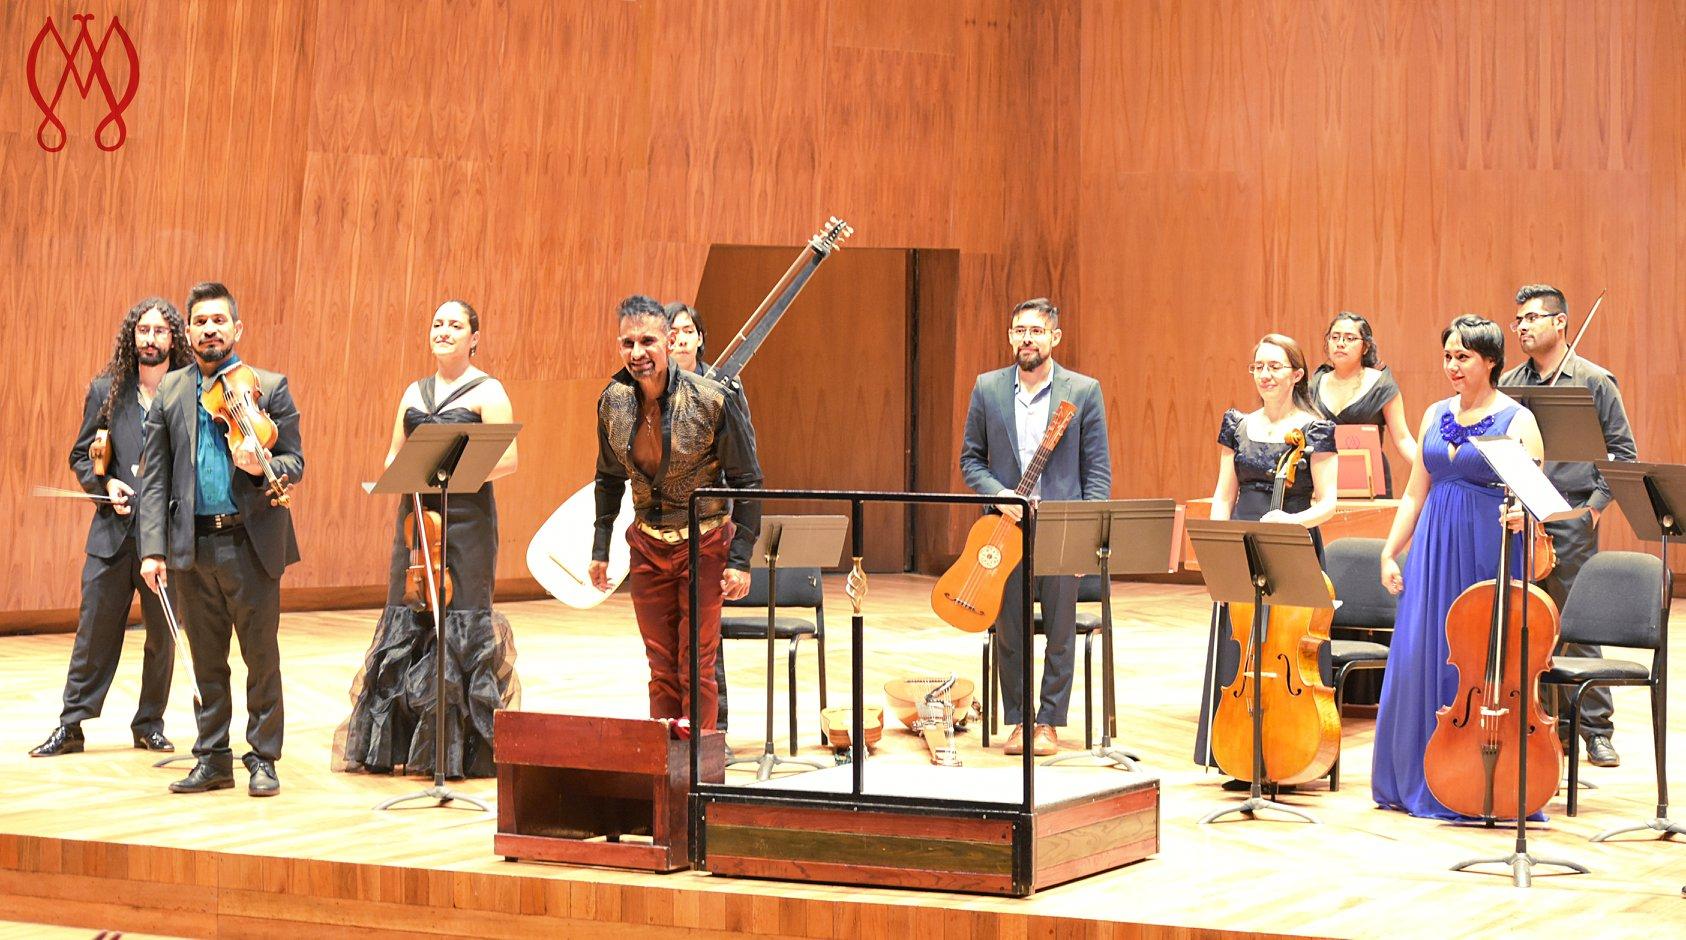 La Orquesta Barroca Antiqva Metrópoli celebra 10 años